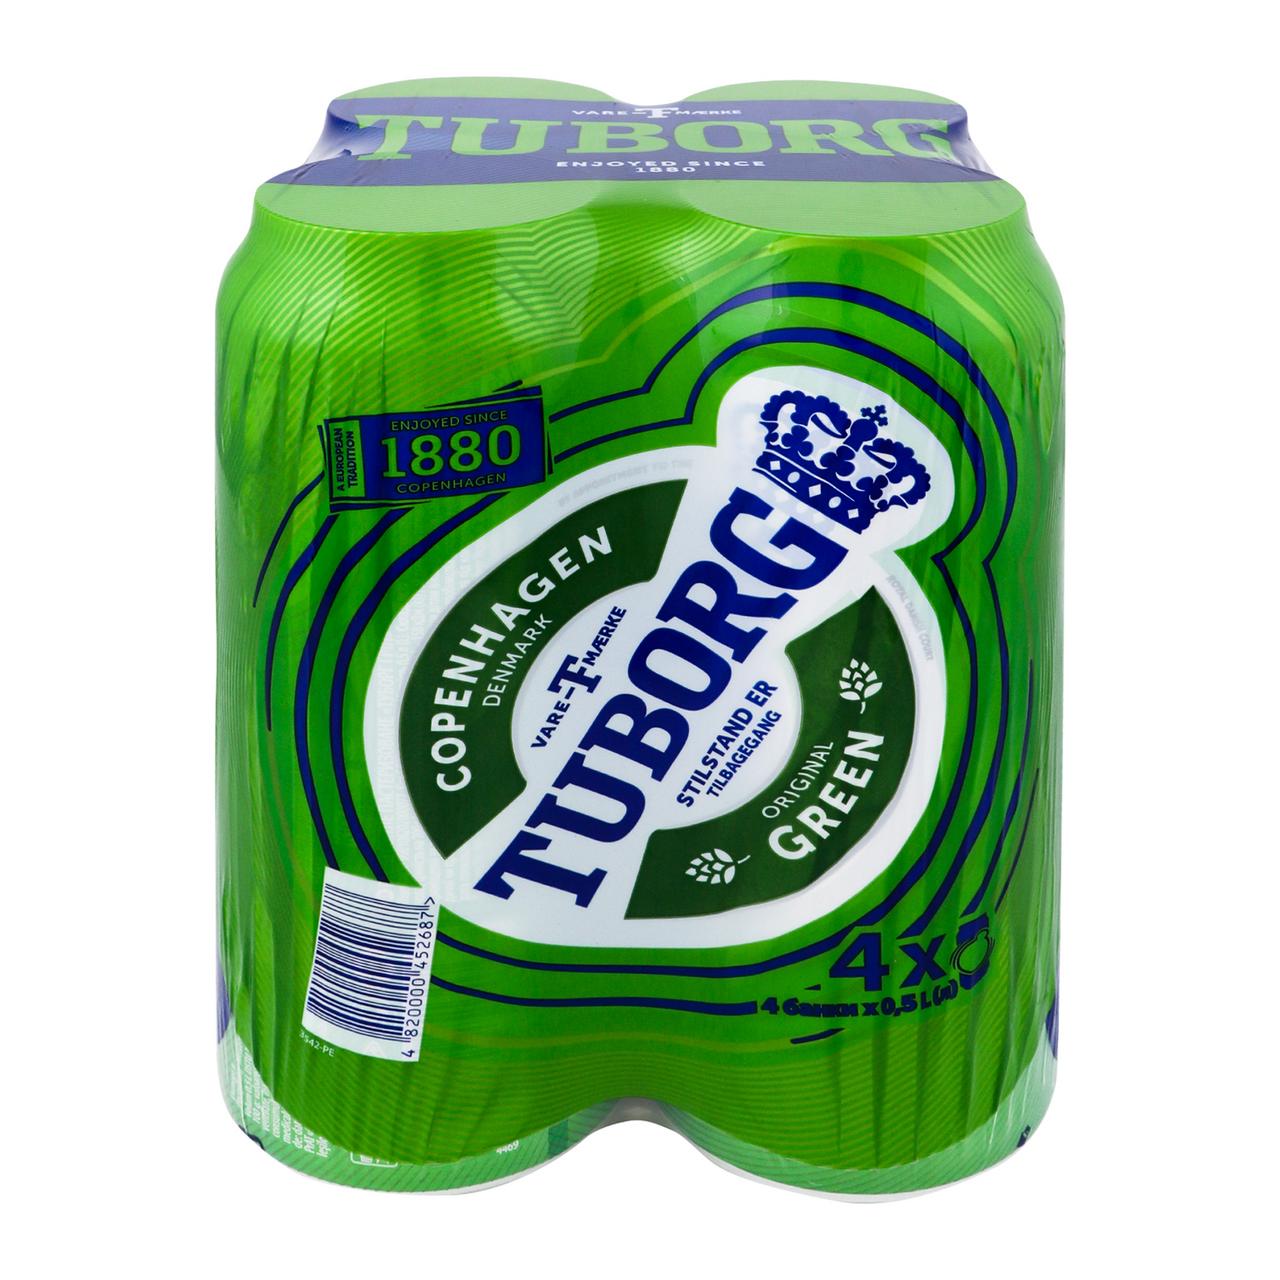 Пиво Tuborg Green світле пастеризоване 4.6% 4*0.5л/уп